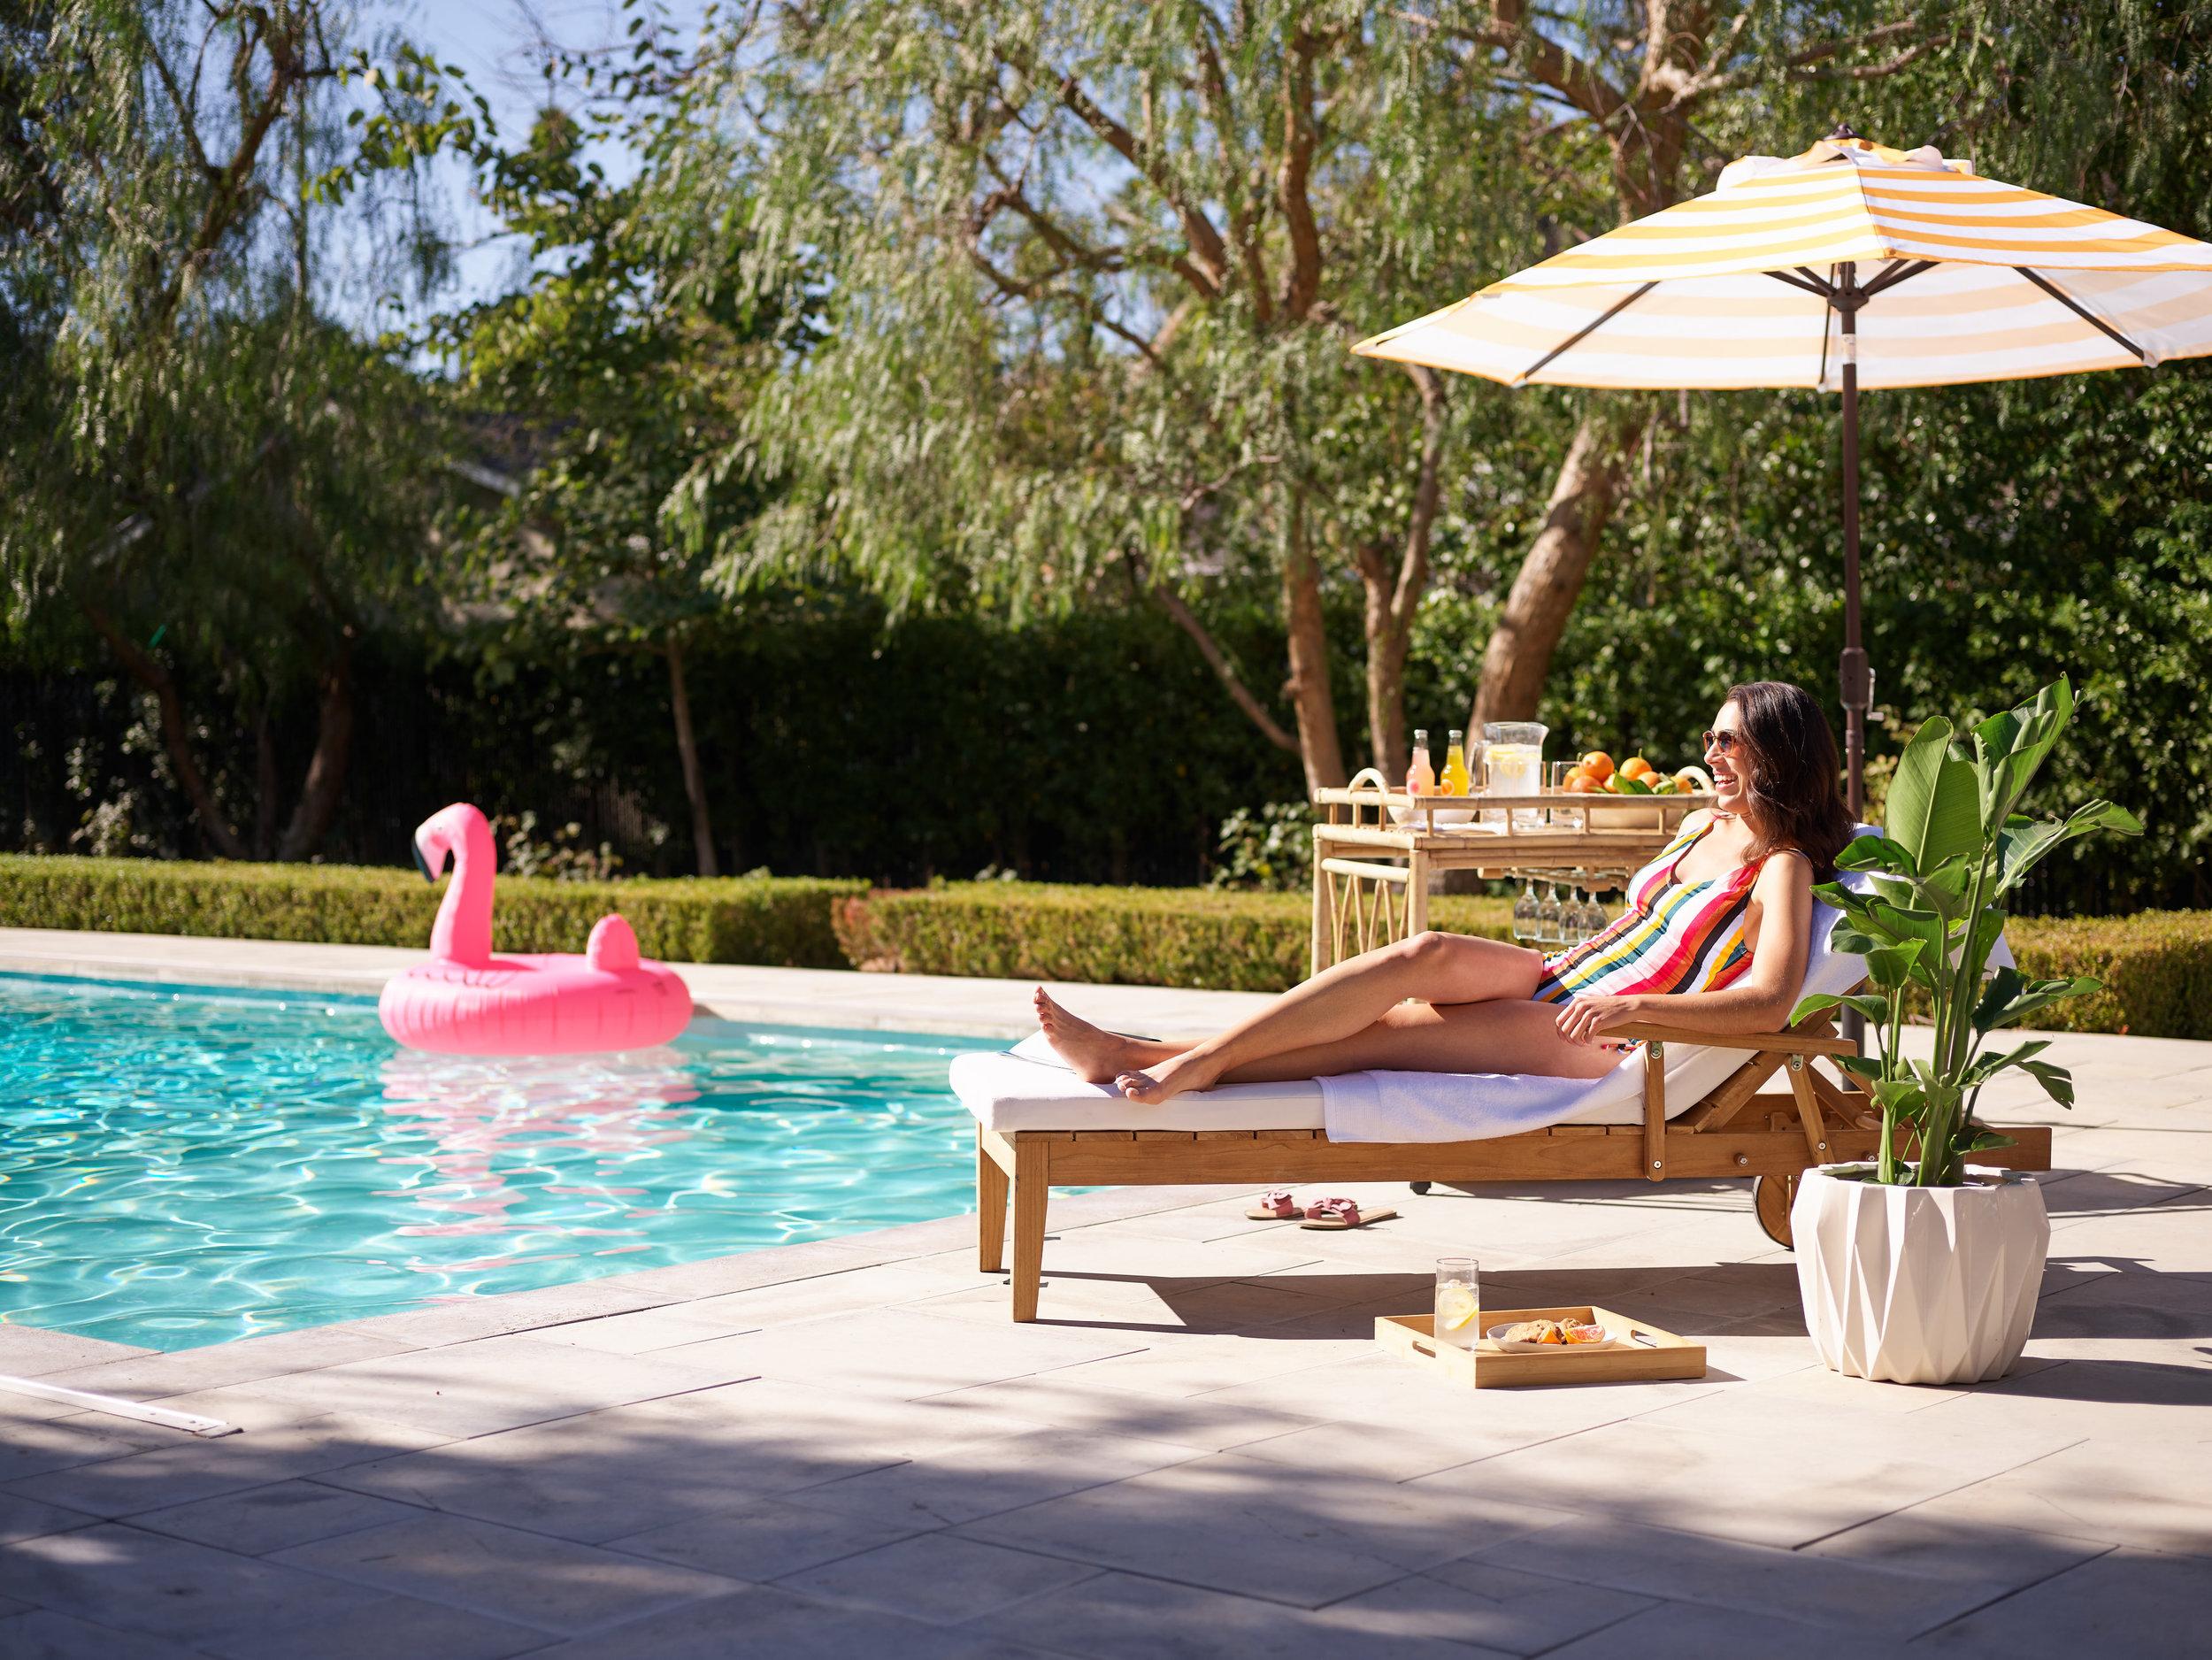 43954_SpringForward_Poolside_Lounge_35261.jpg